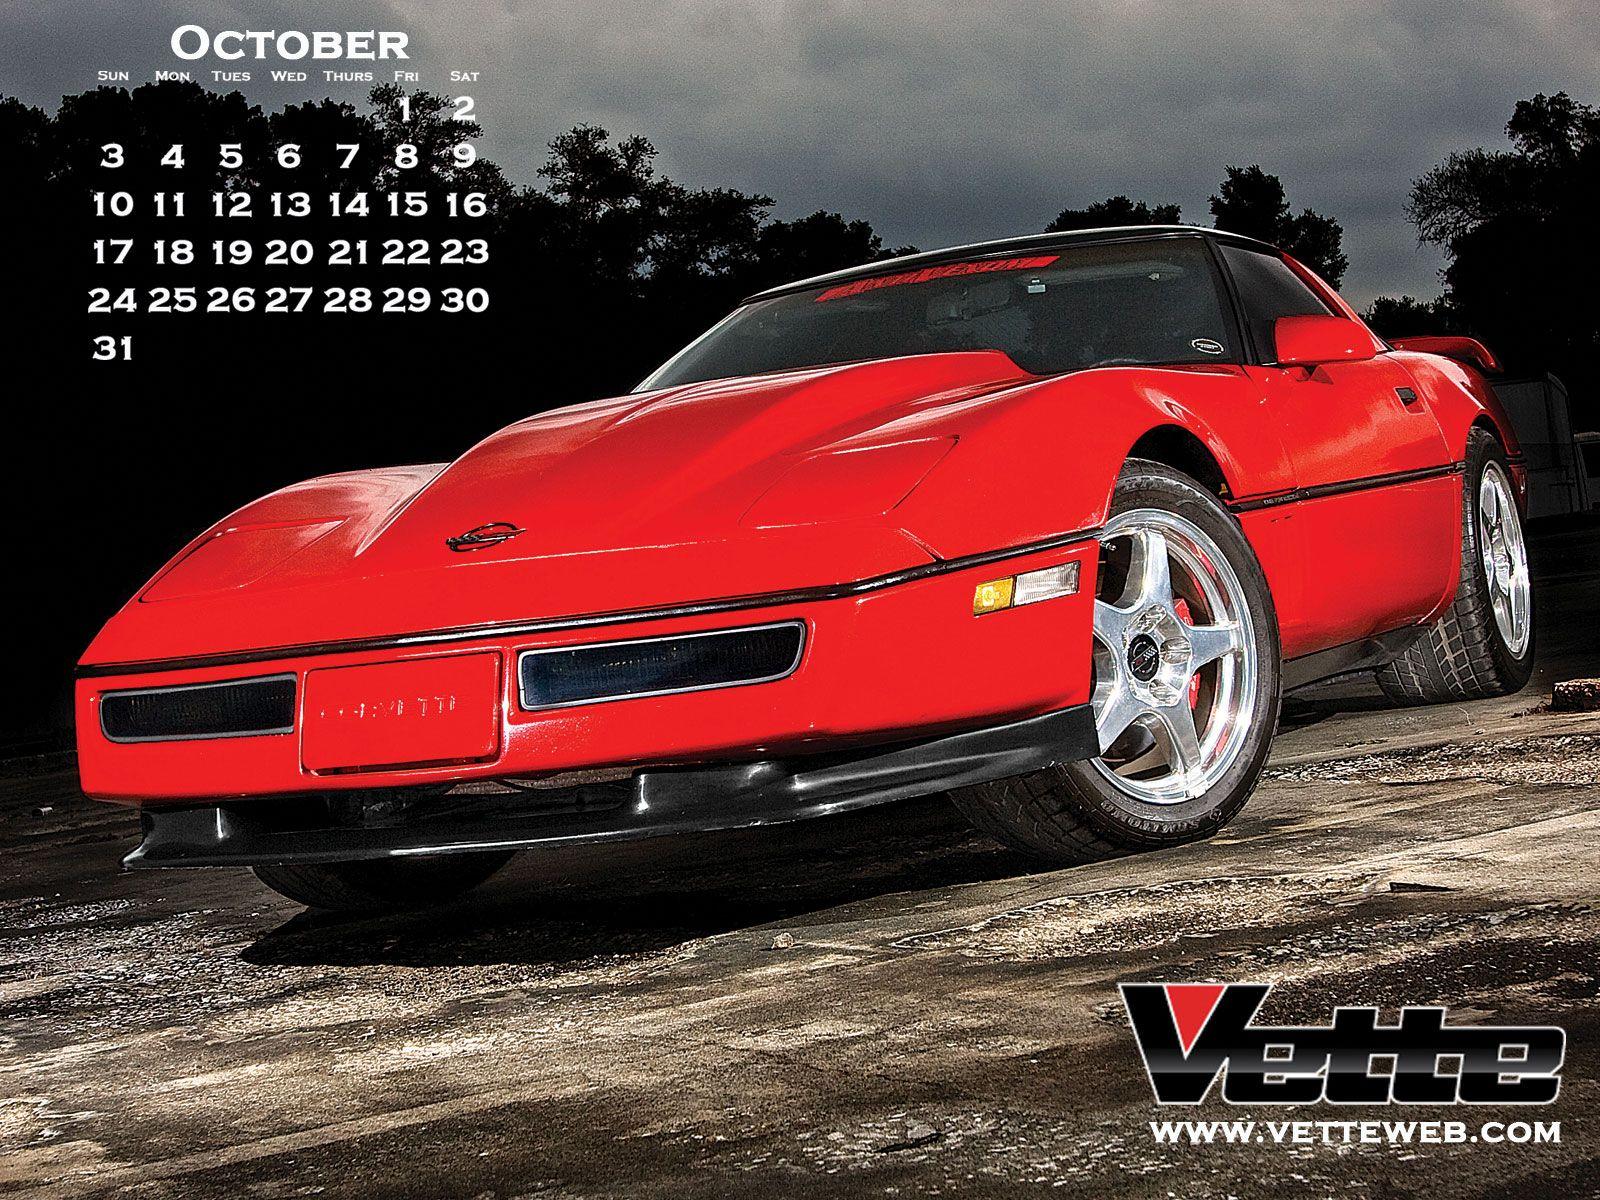 2010 October Calendar   Corvette Action Center   Corvette Forum 1600x1200